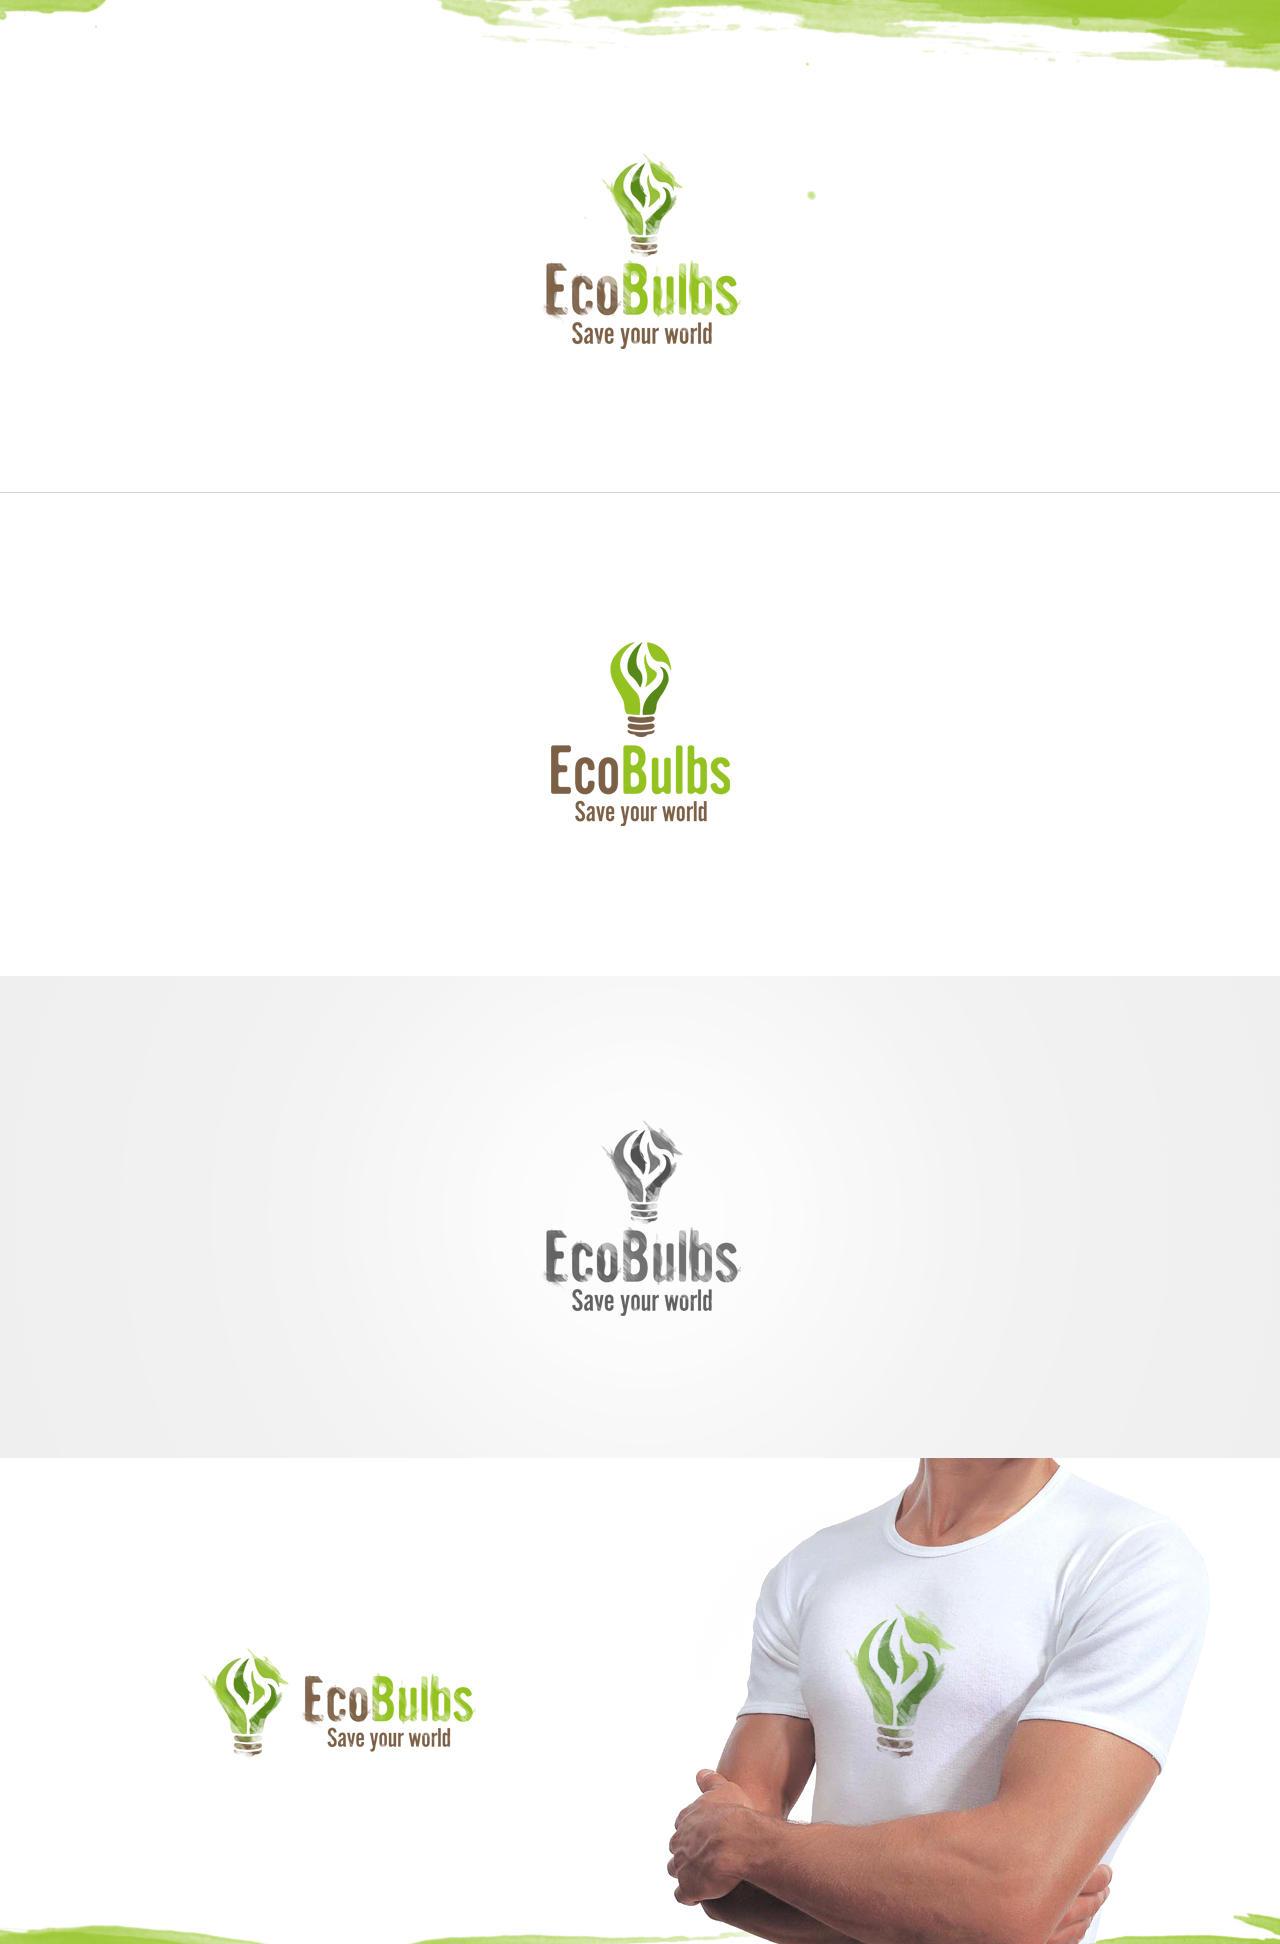 EcoBulbs by djtrus